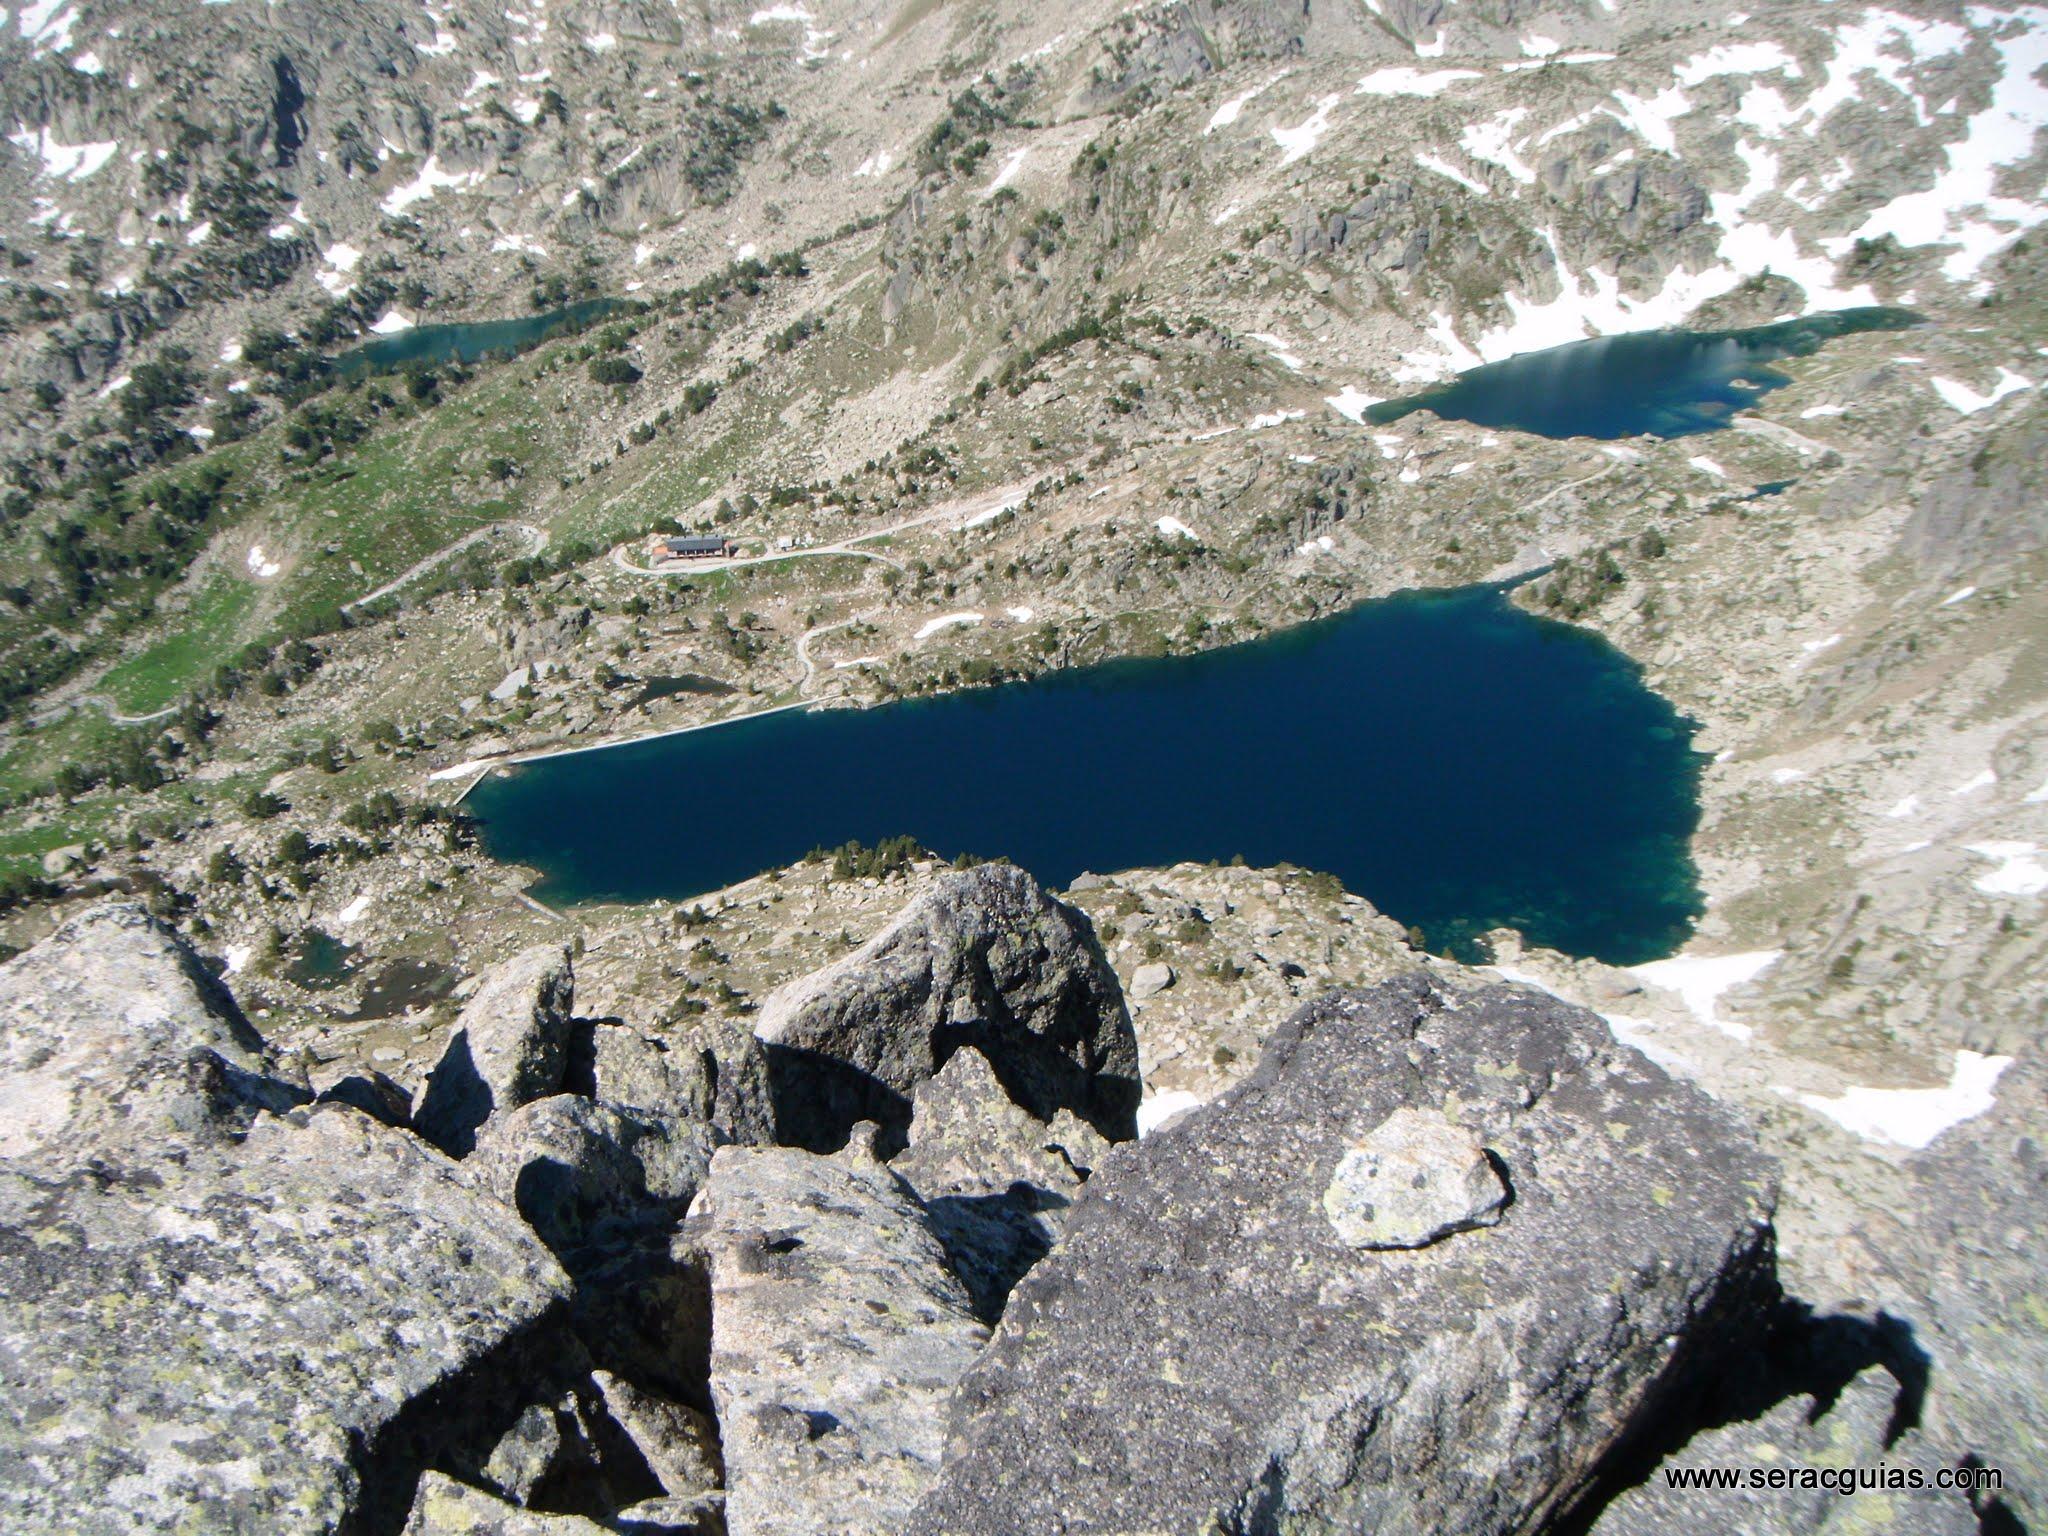 Cresta Basiero Amitges Pirineo 6 SERAC COMPAÑÍA DE GUÍAS